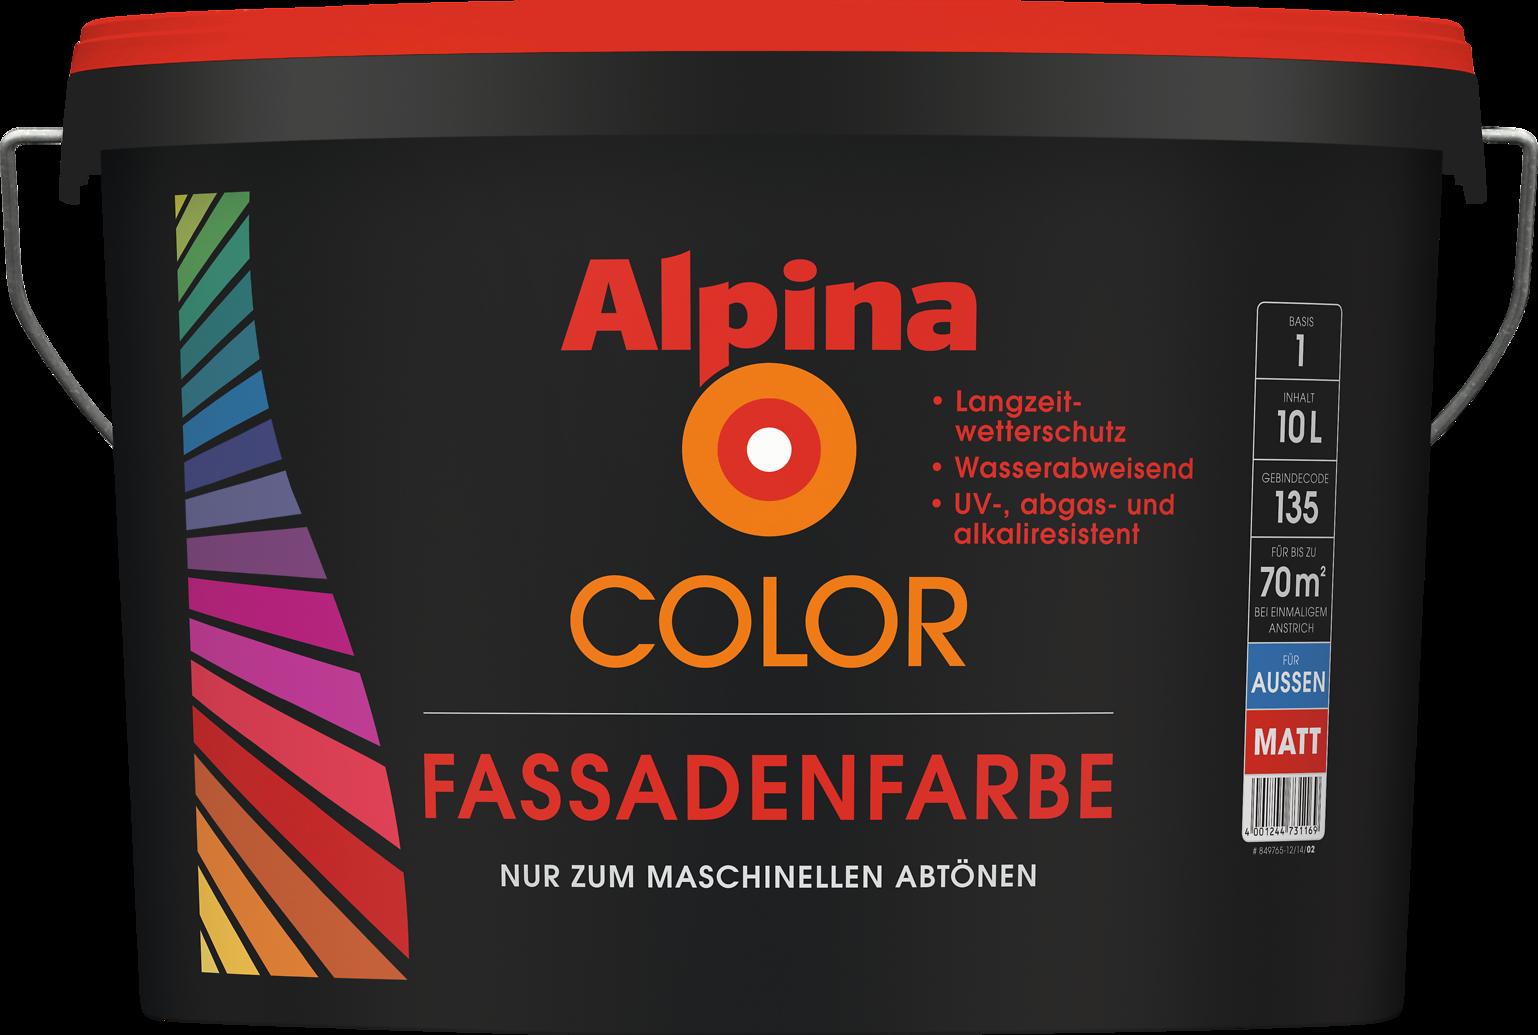 haus farbe individuell mischen lassen alpina color fassadenfarbe alpina farben. Black Bedroom Furniture Sets. Home Design Ideas